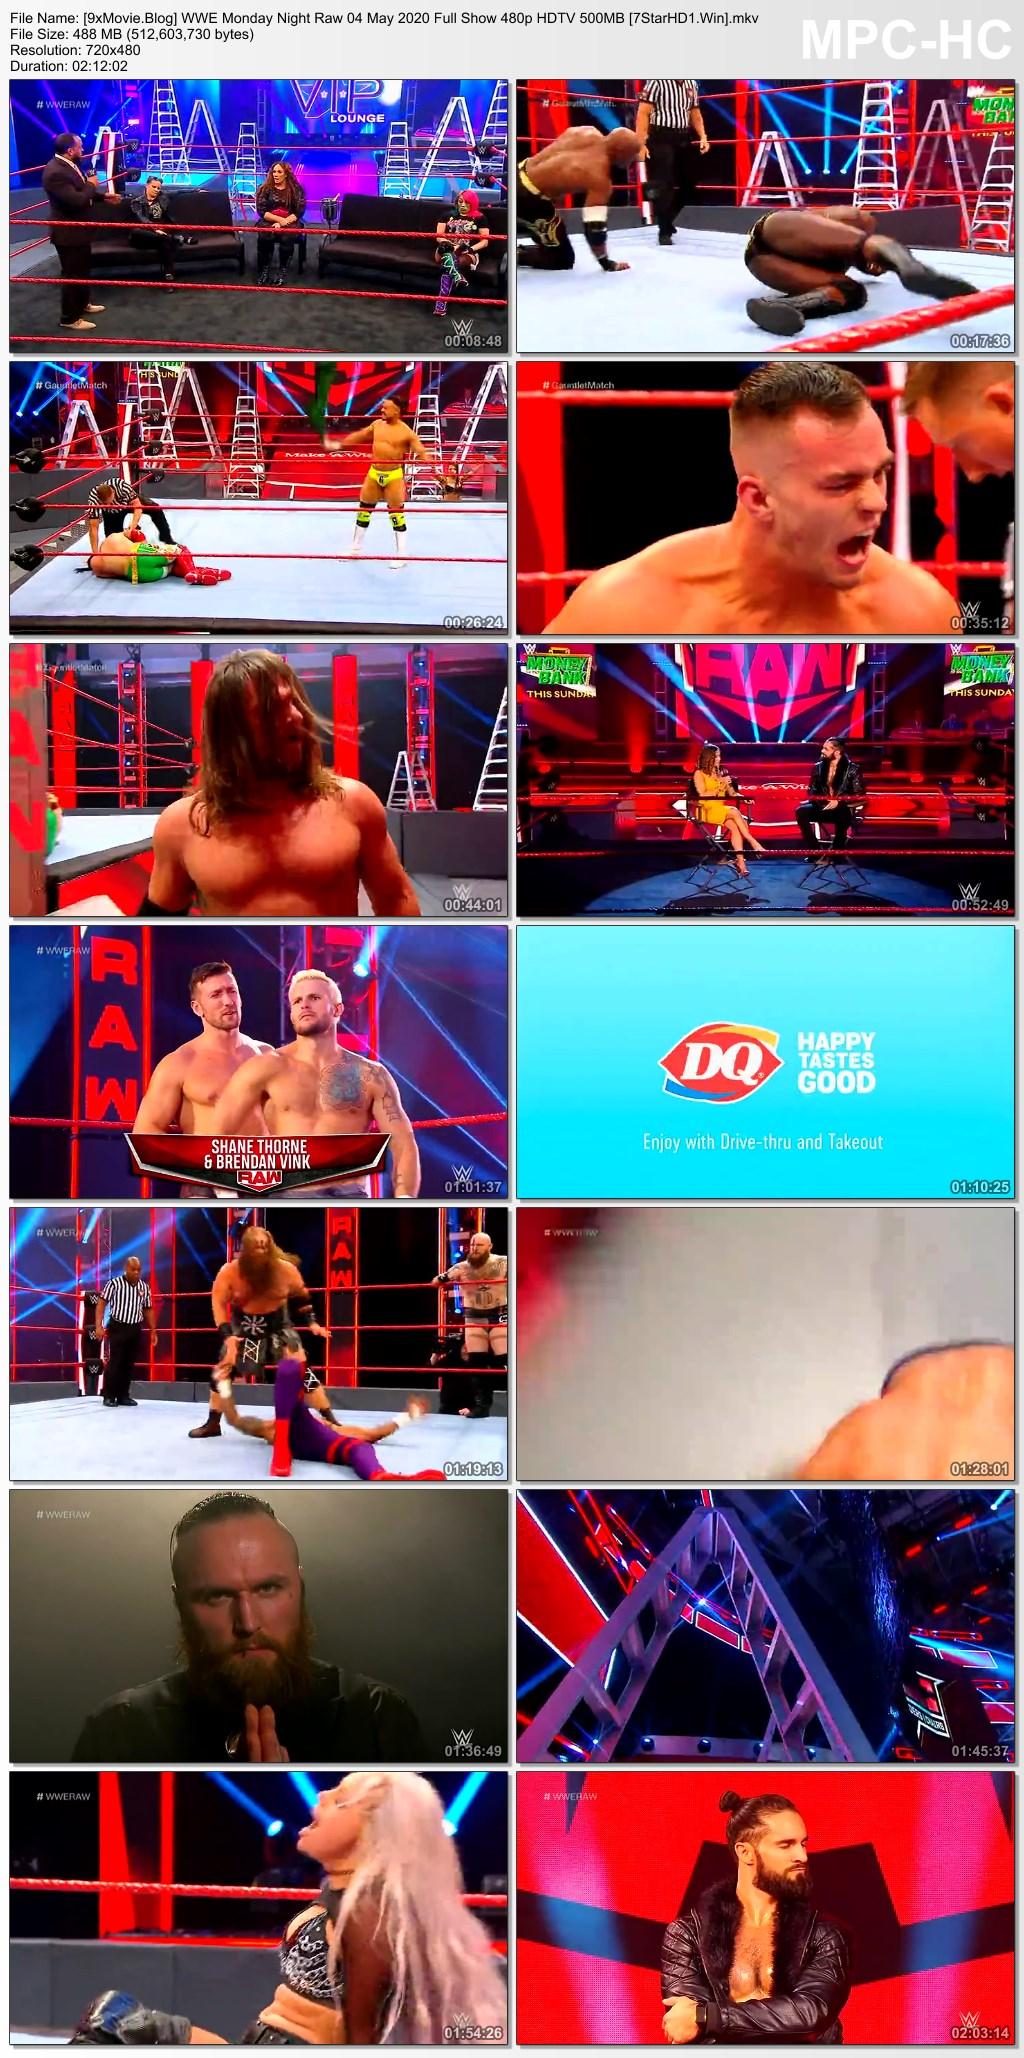 WWE Monday Night Raw 04 May 2020 Full Show 480p HDTV x264 500MB